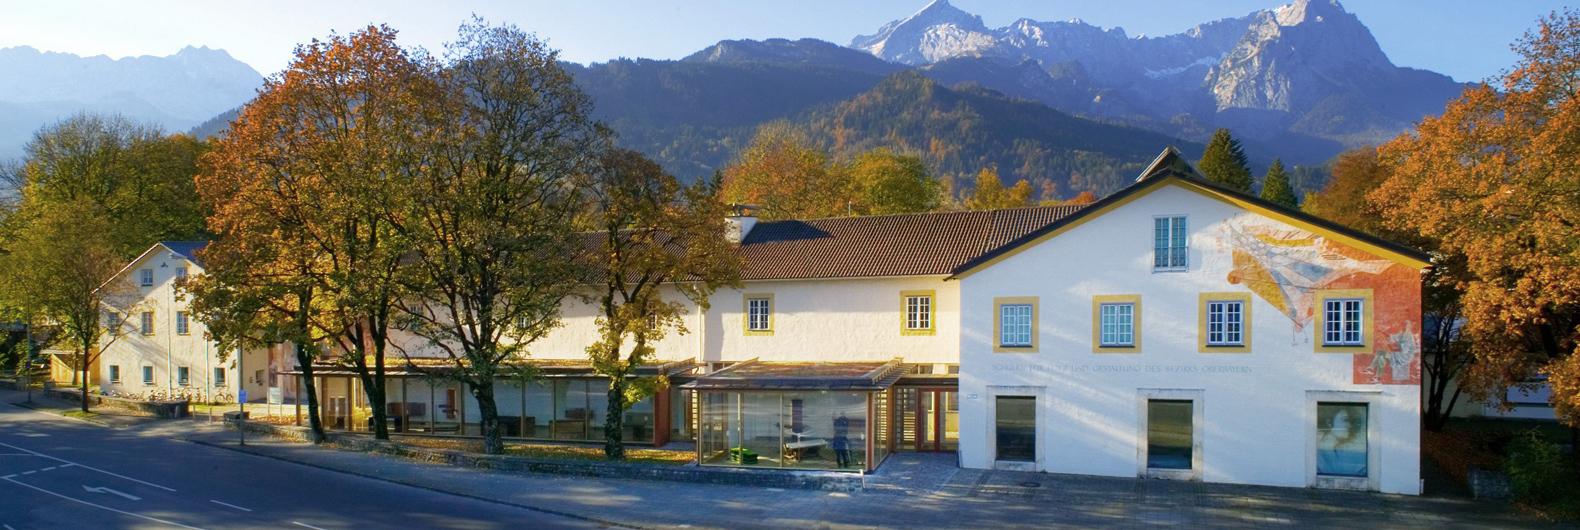 Schnitzschule Garmisch